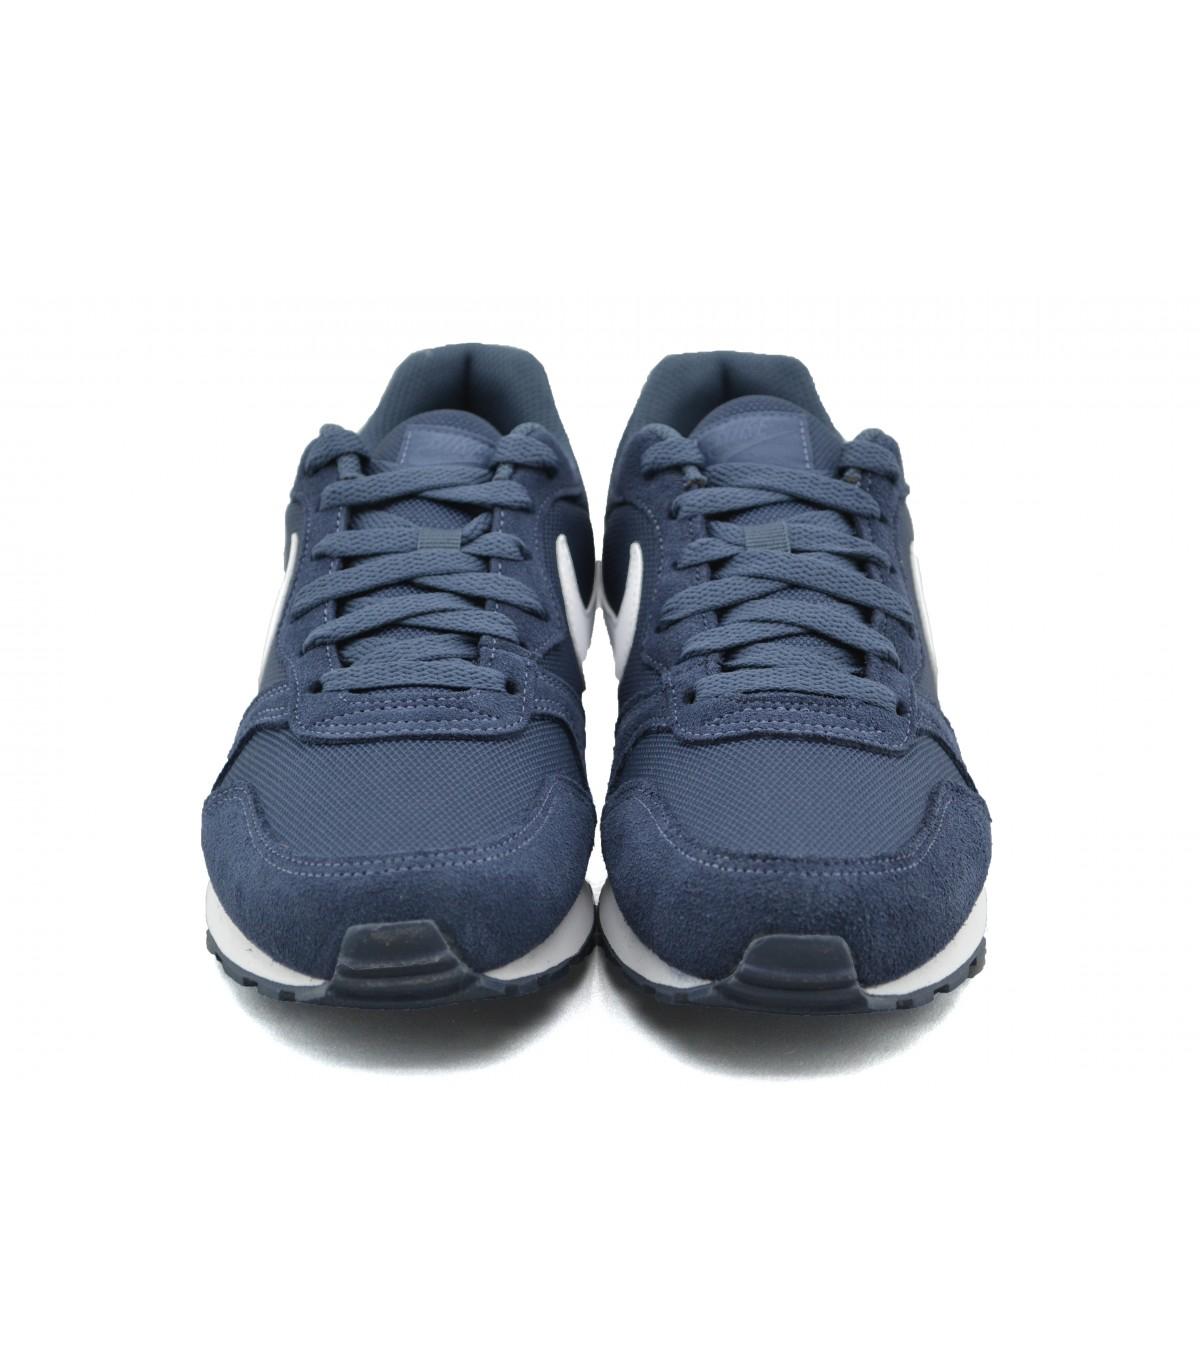 4eb3ca4962d Deportivas niño NIKE MD Runner blu